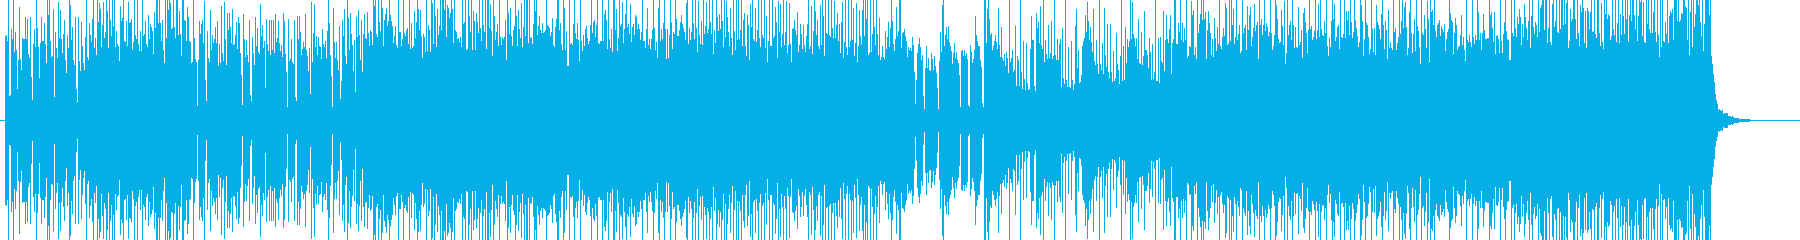 【HARD/HEAVY】DARKROCKの再生済みの波形